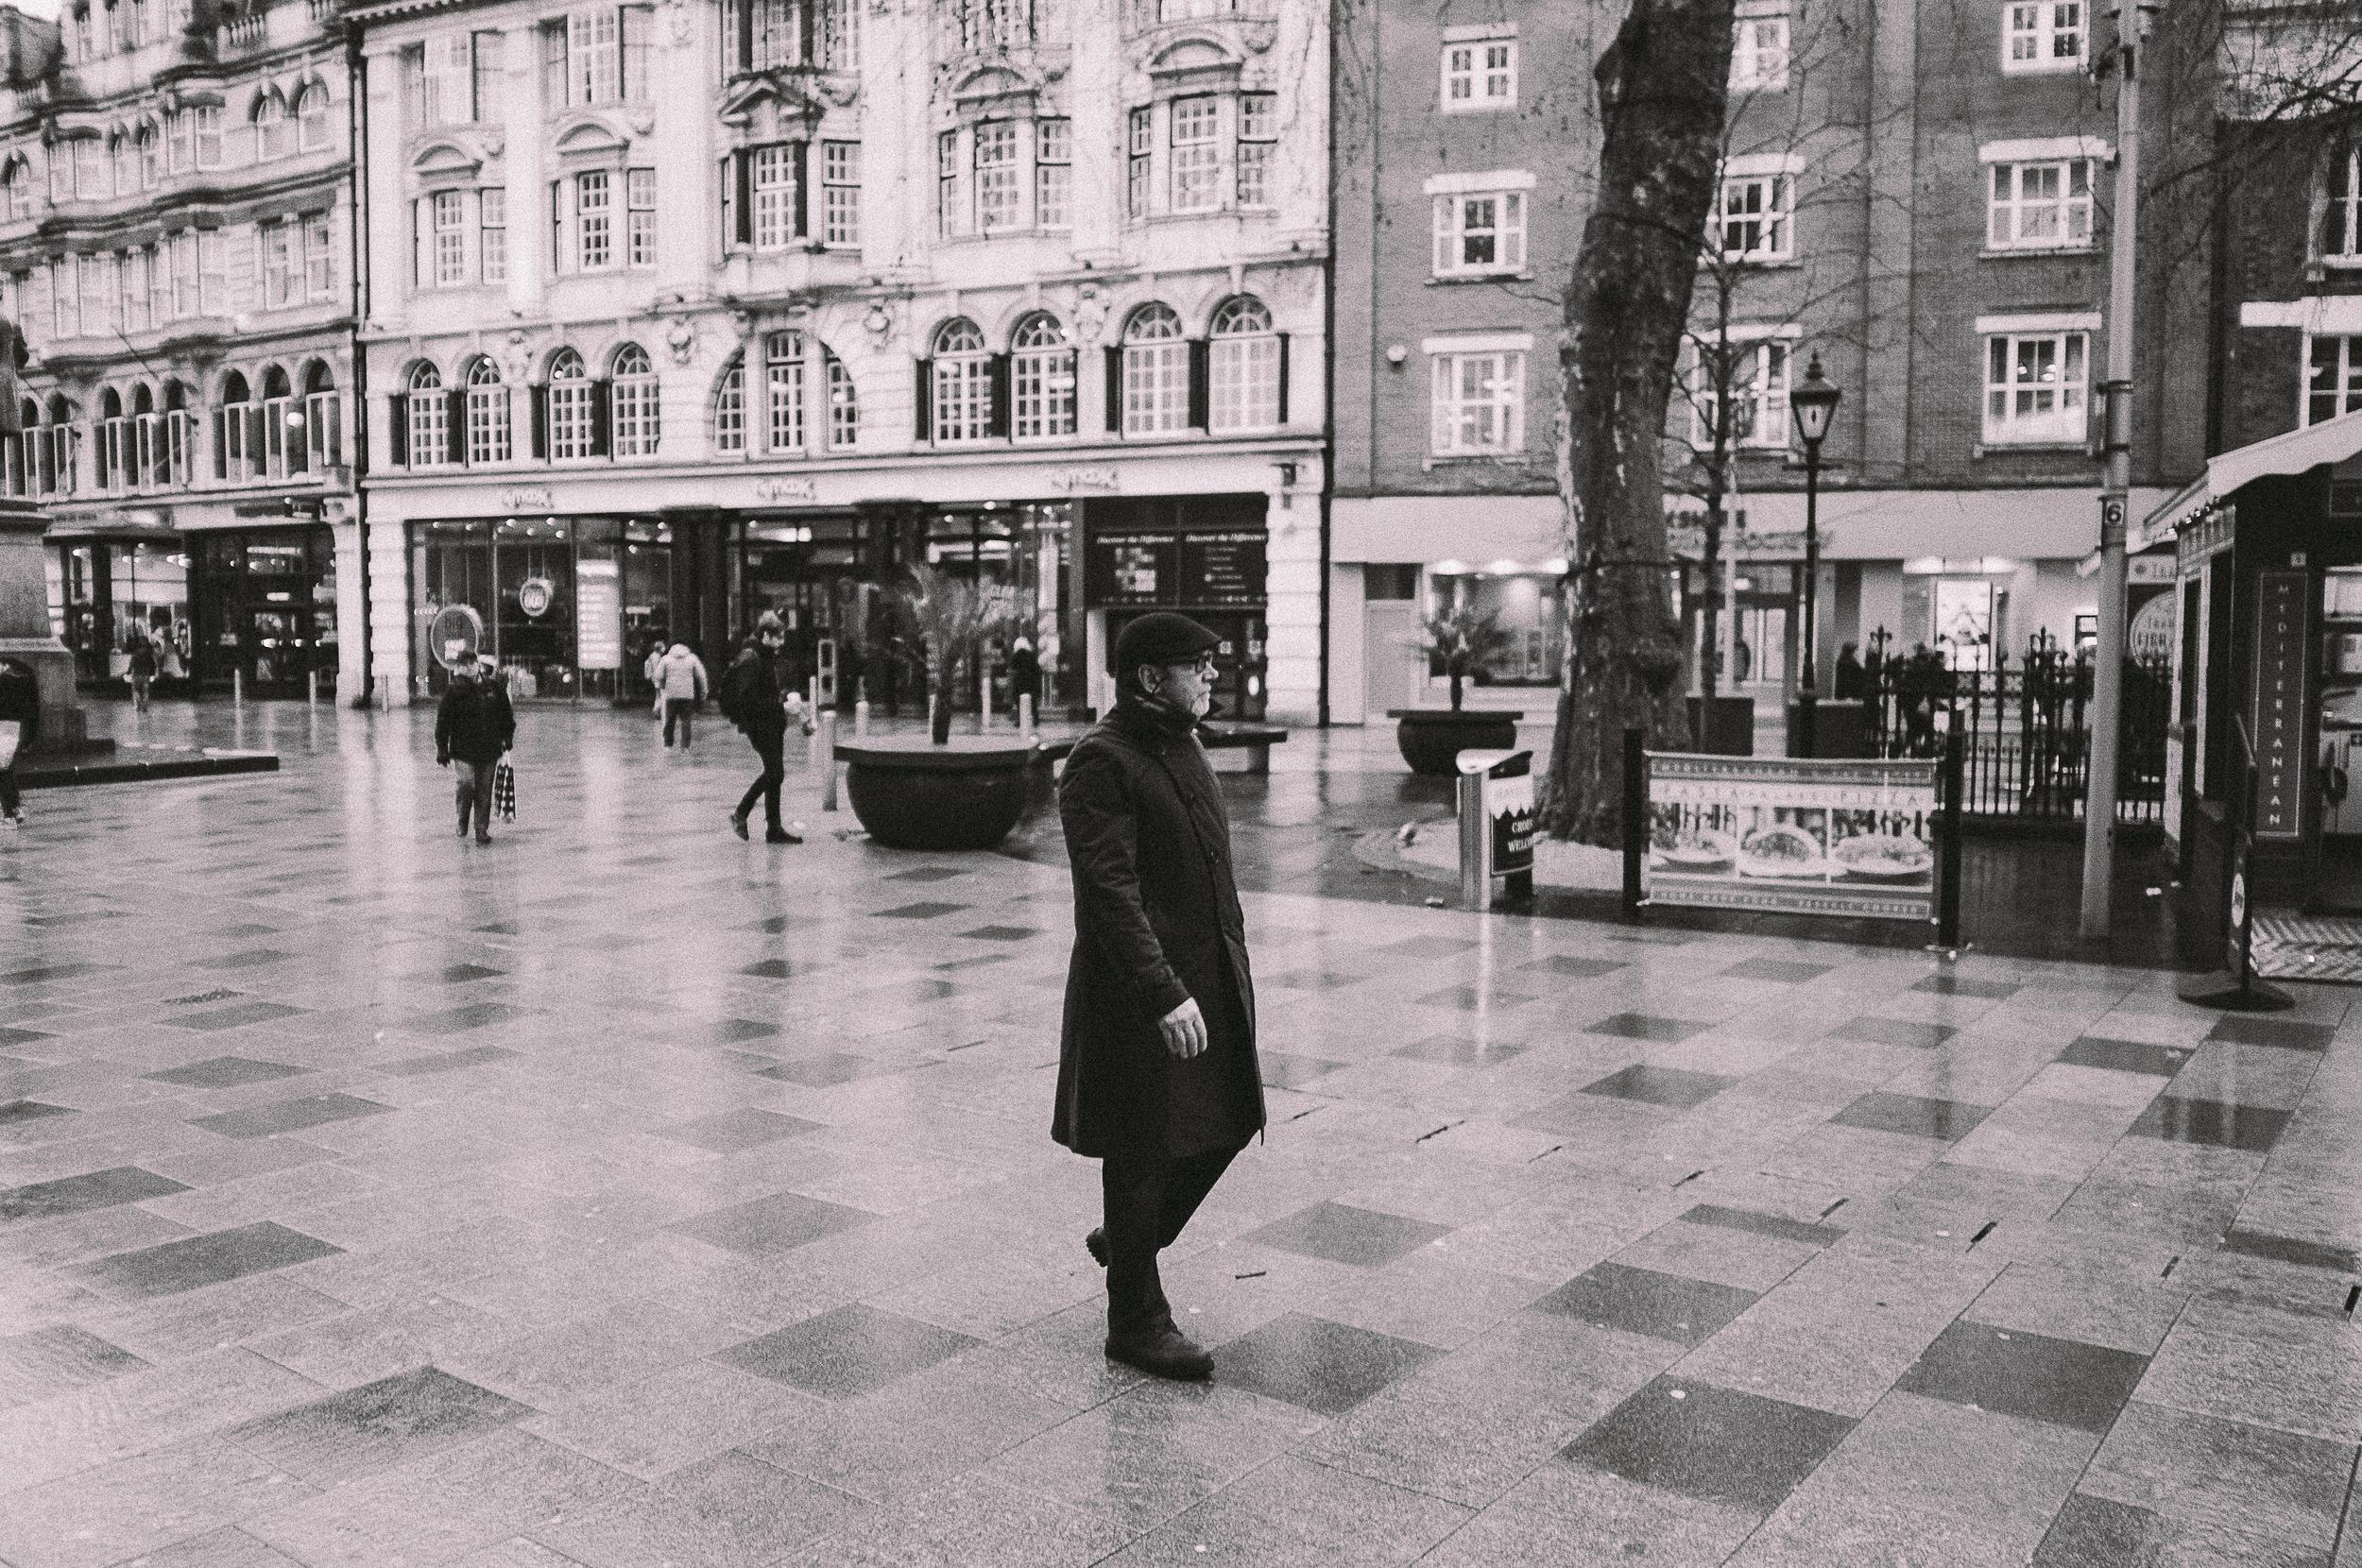 Cardiff Street Photography-1-5.jpg